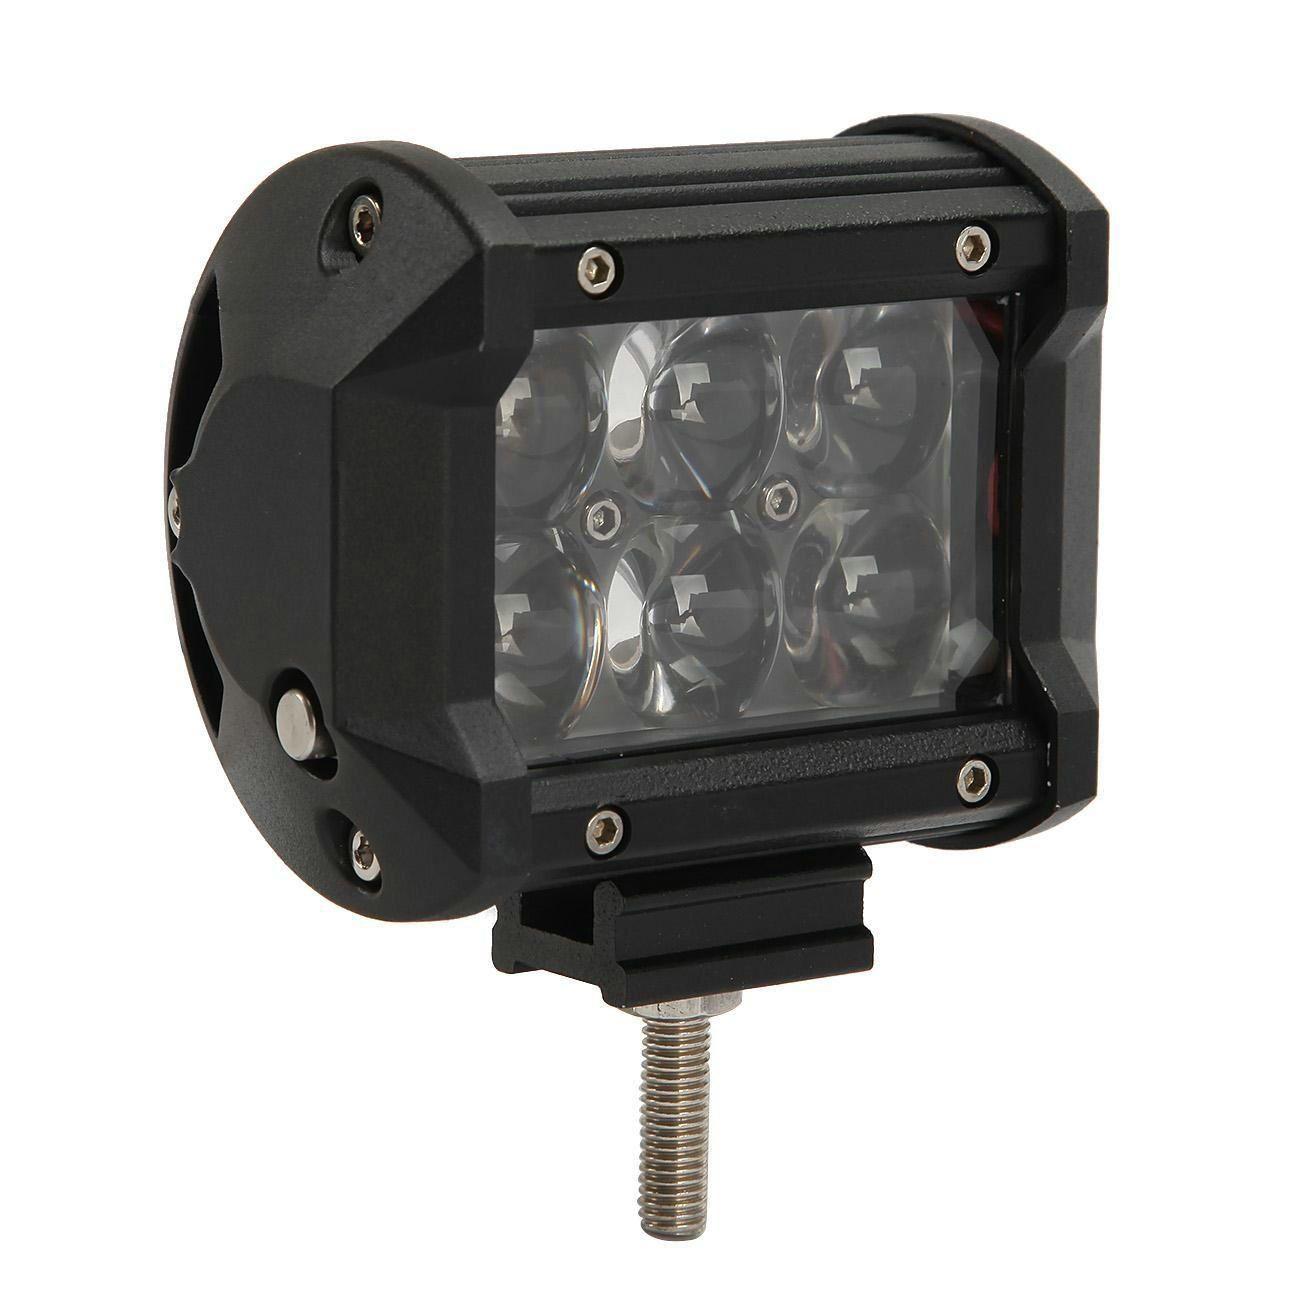 2pcs 30W Osram LED Light Bar fuoristrada 12V 24V Spot / Flood 4D 4x4 Auto SUV Offroad Truck ATV Moto DRL LED BAR Driving Light